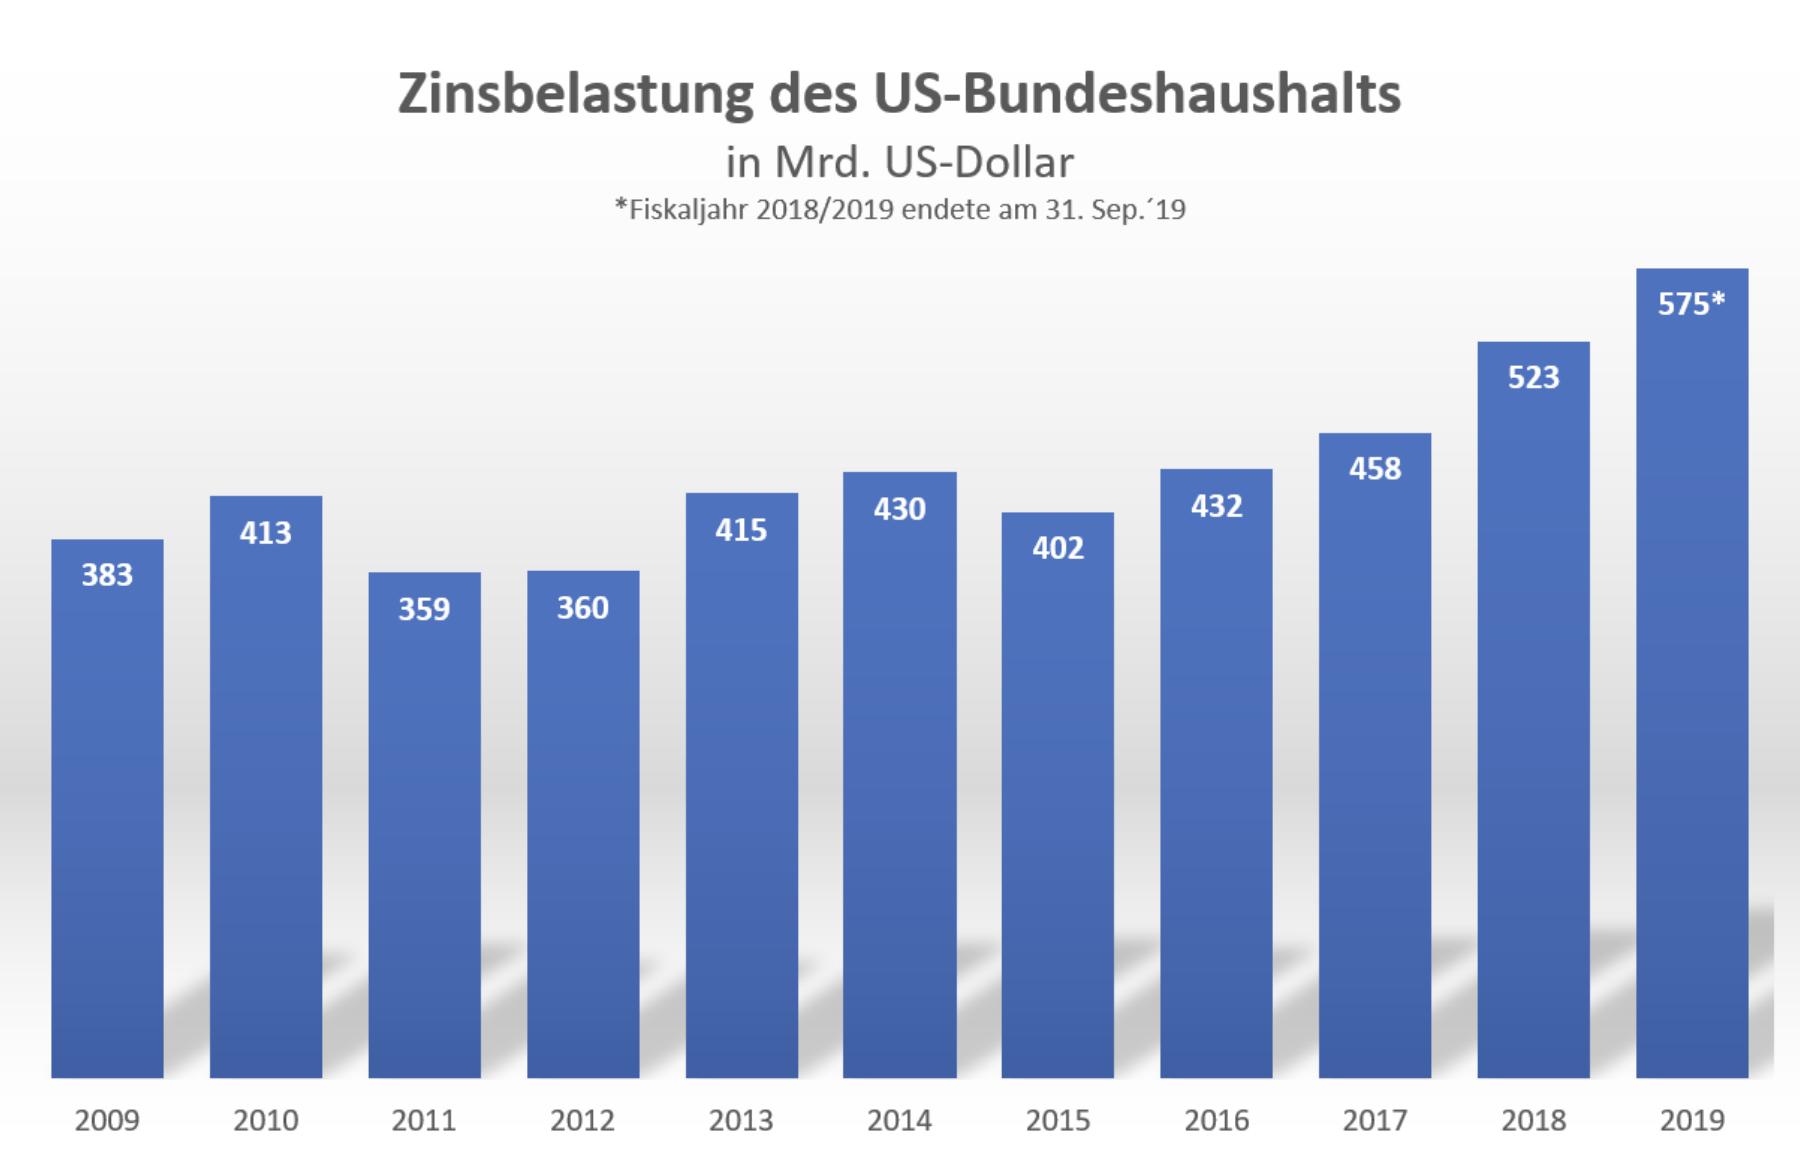 Zinsbelastung US-Bundeshaushalt